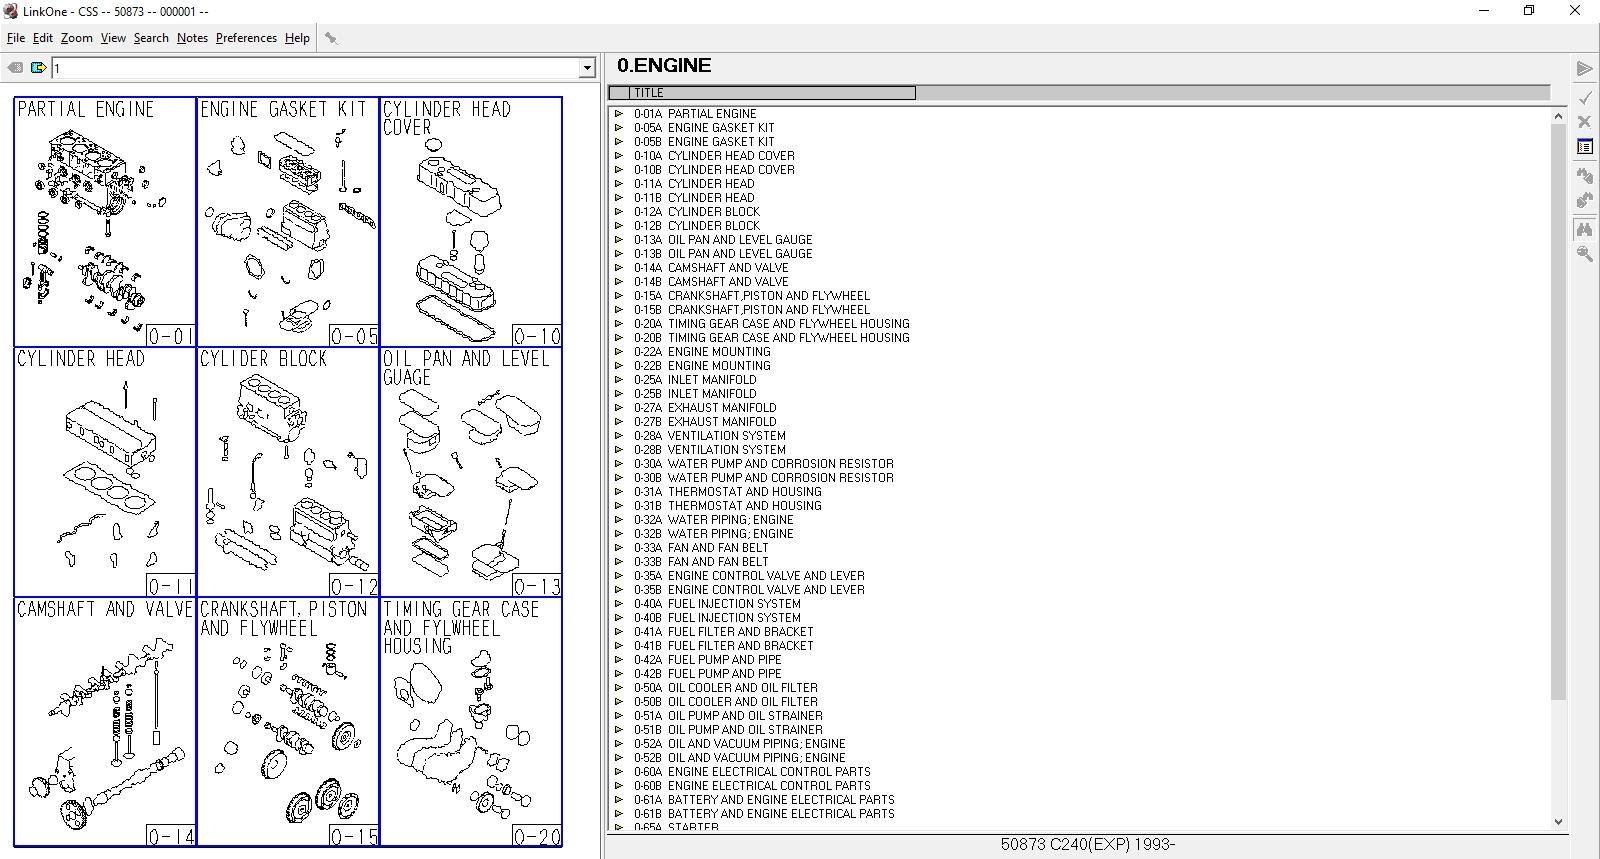 ISUZU_CSS-NET_EPC_052020_Electronic_Parts_Catalog_6